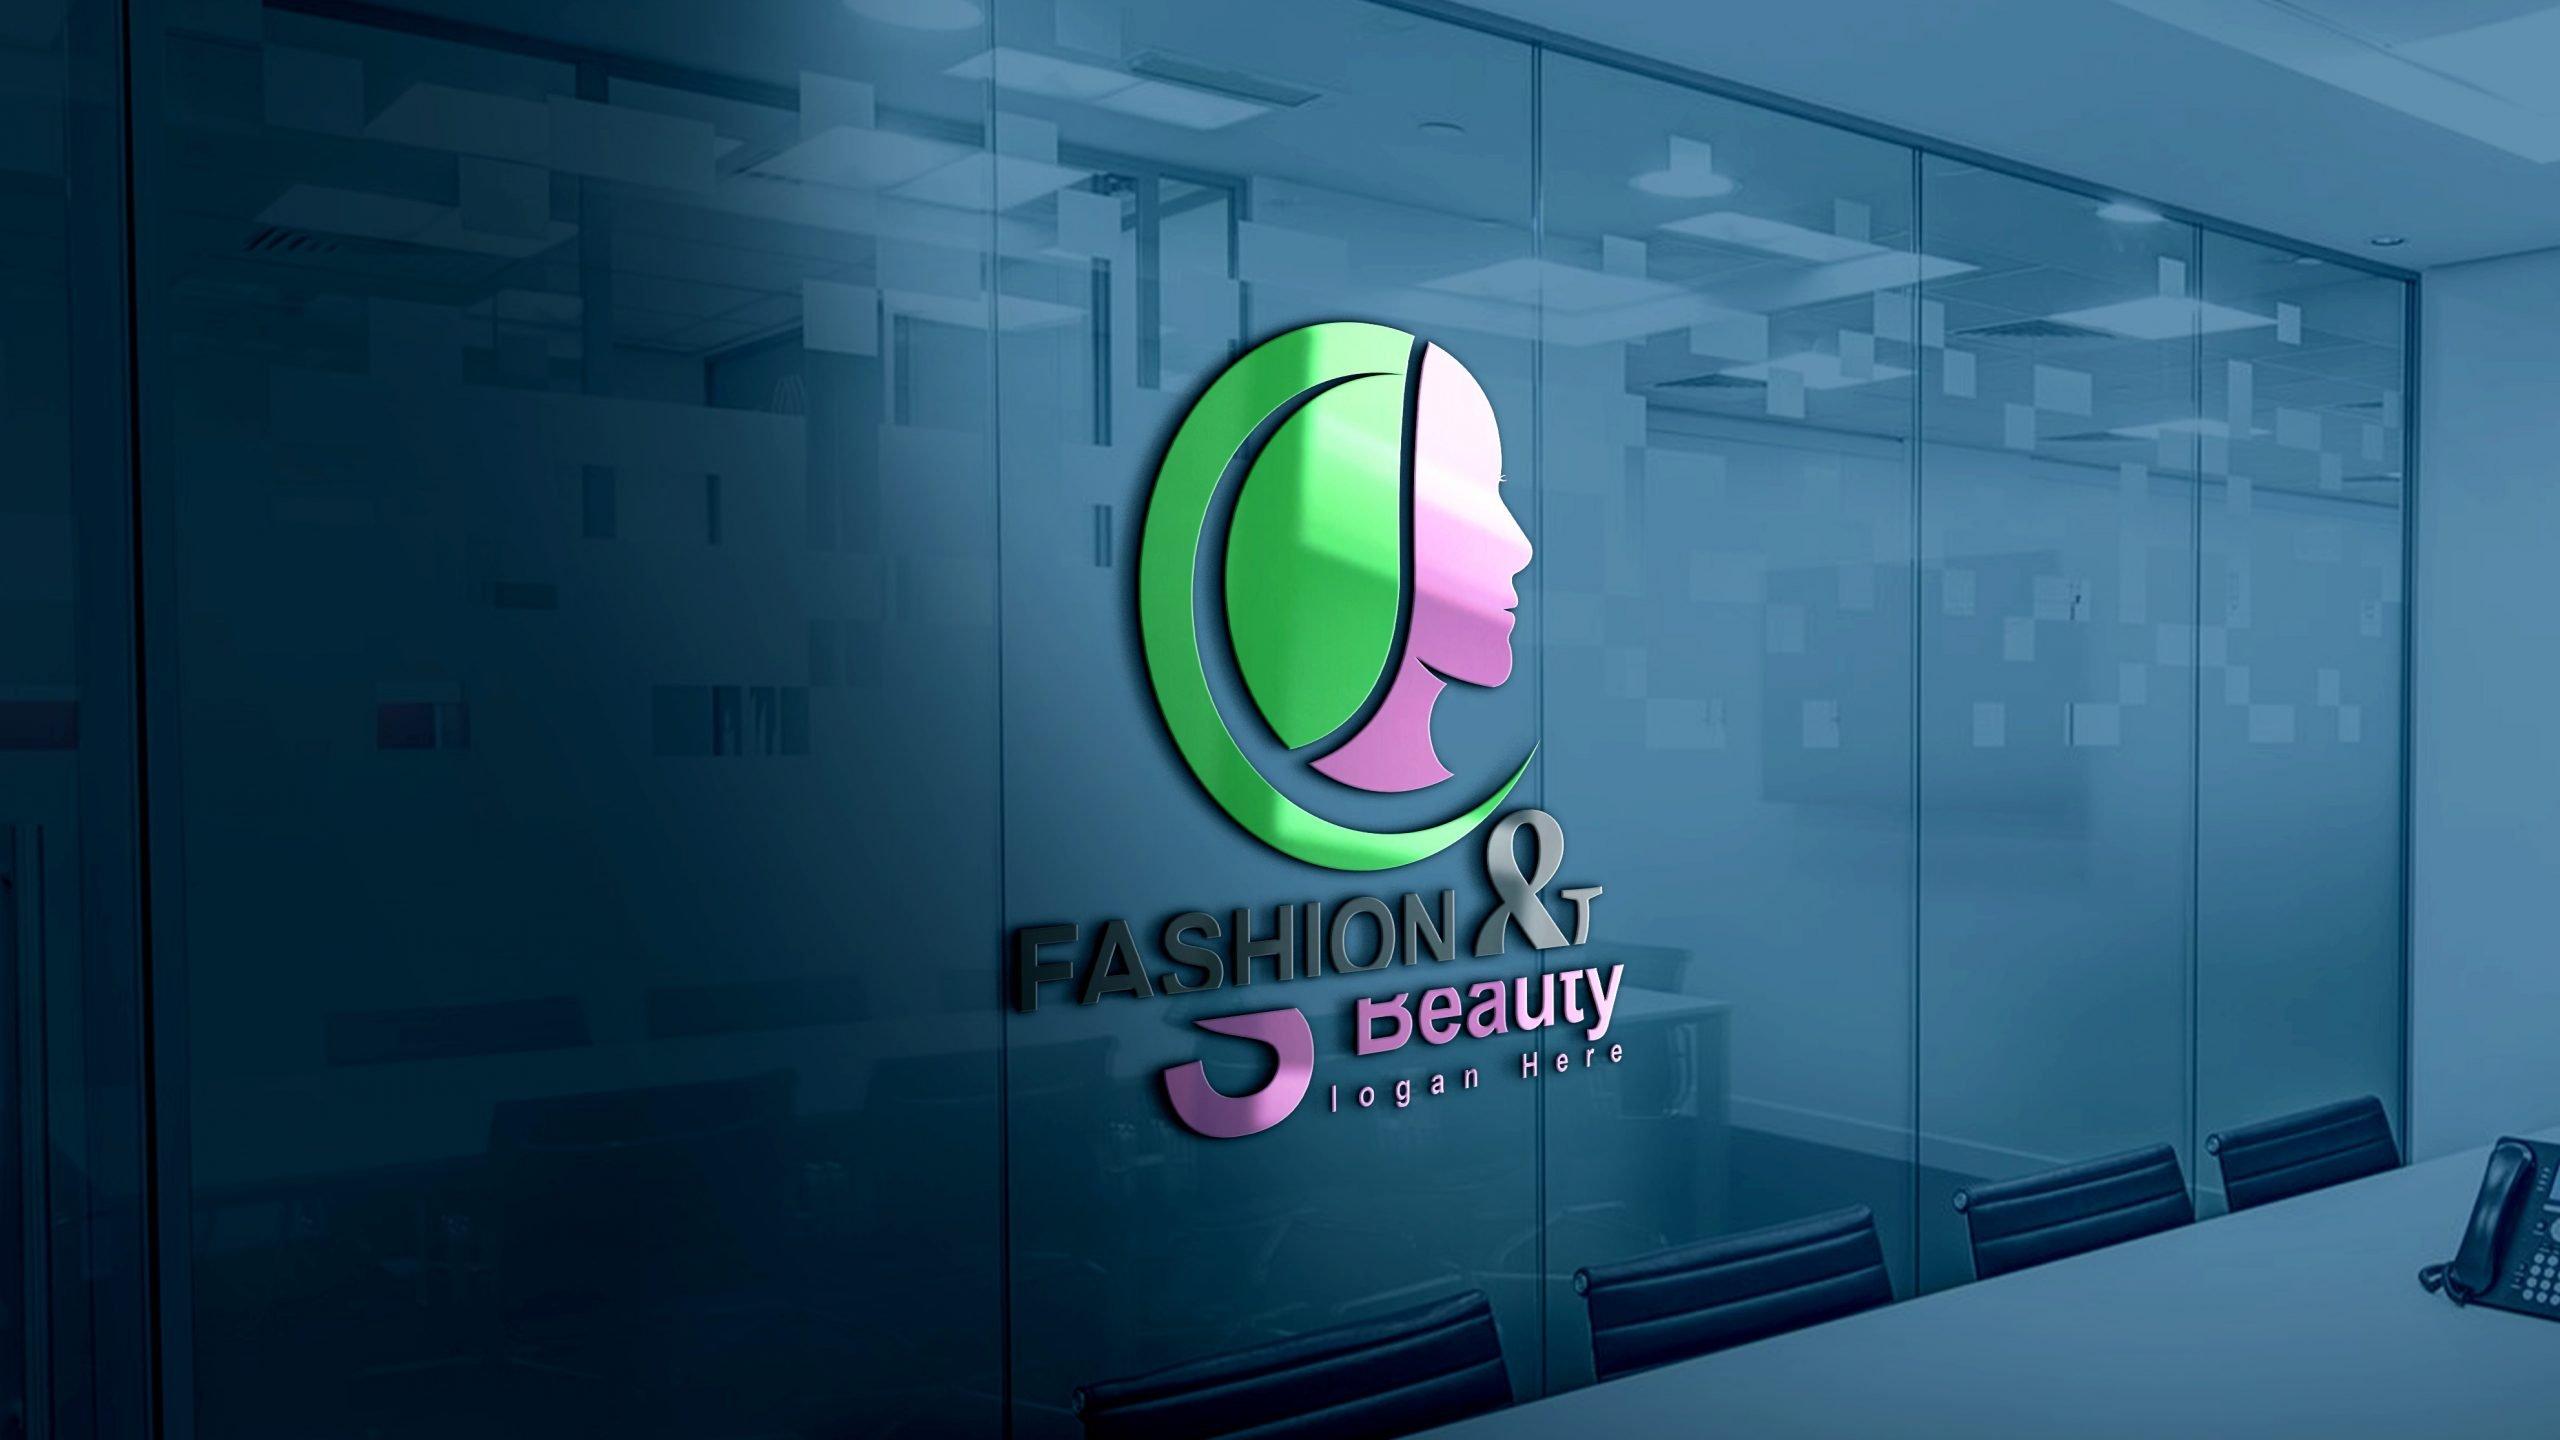 Fashion & Beauty Logo Design office wall